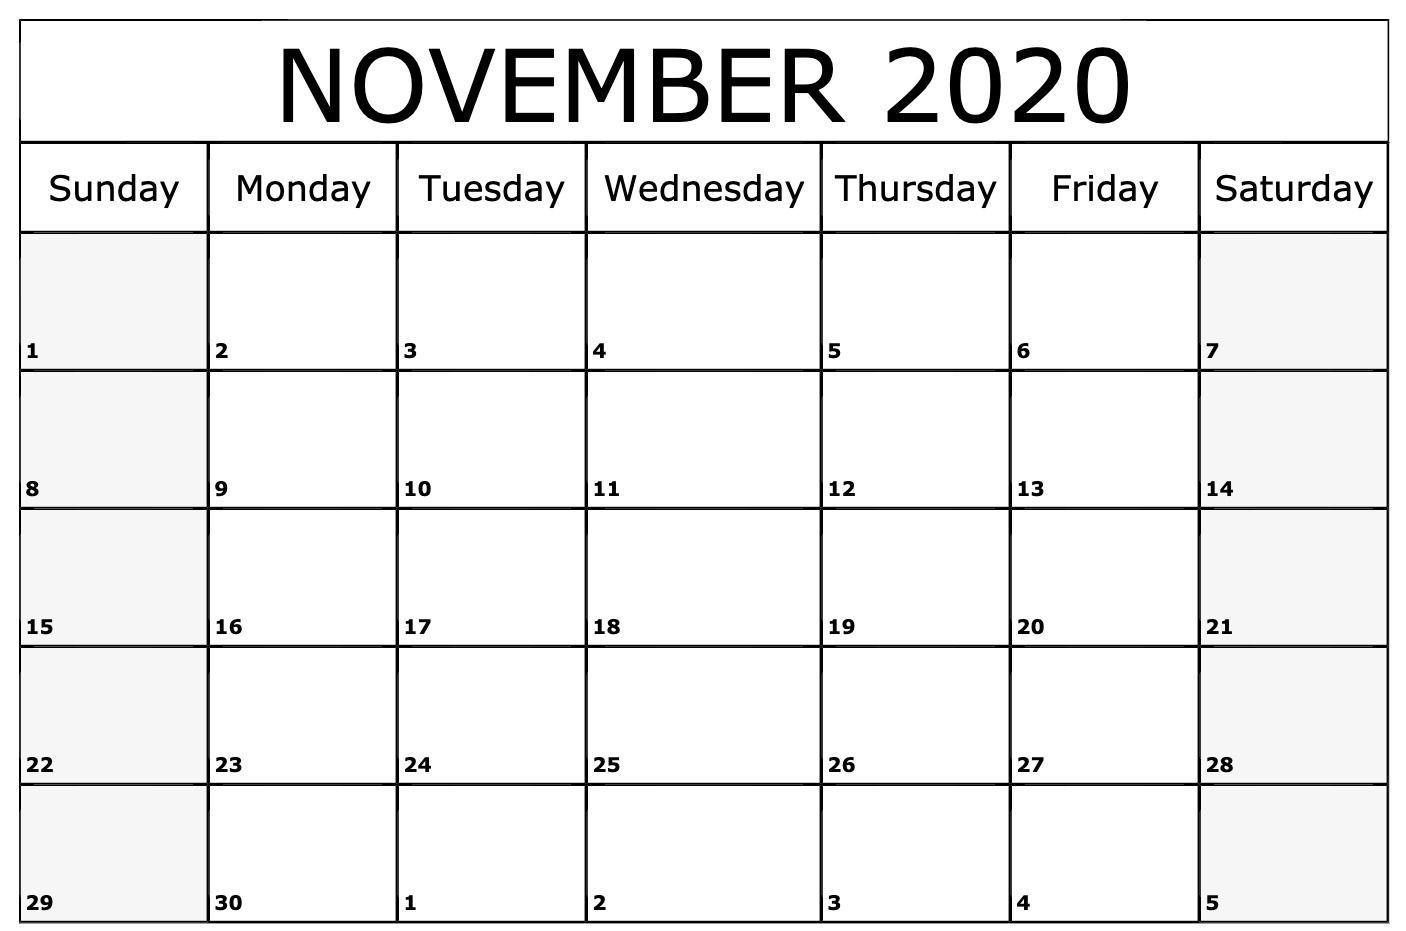 November Calendar 2020 In 2020 | Monthly Calendar